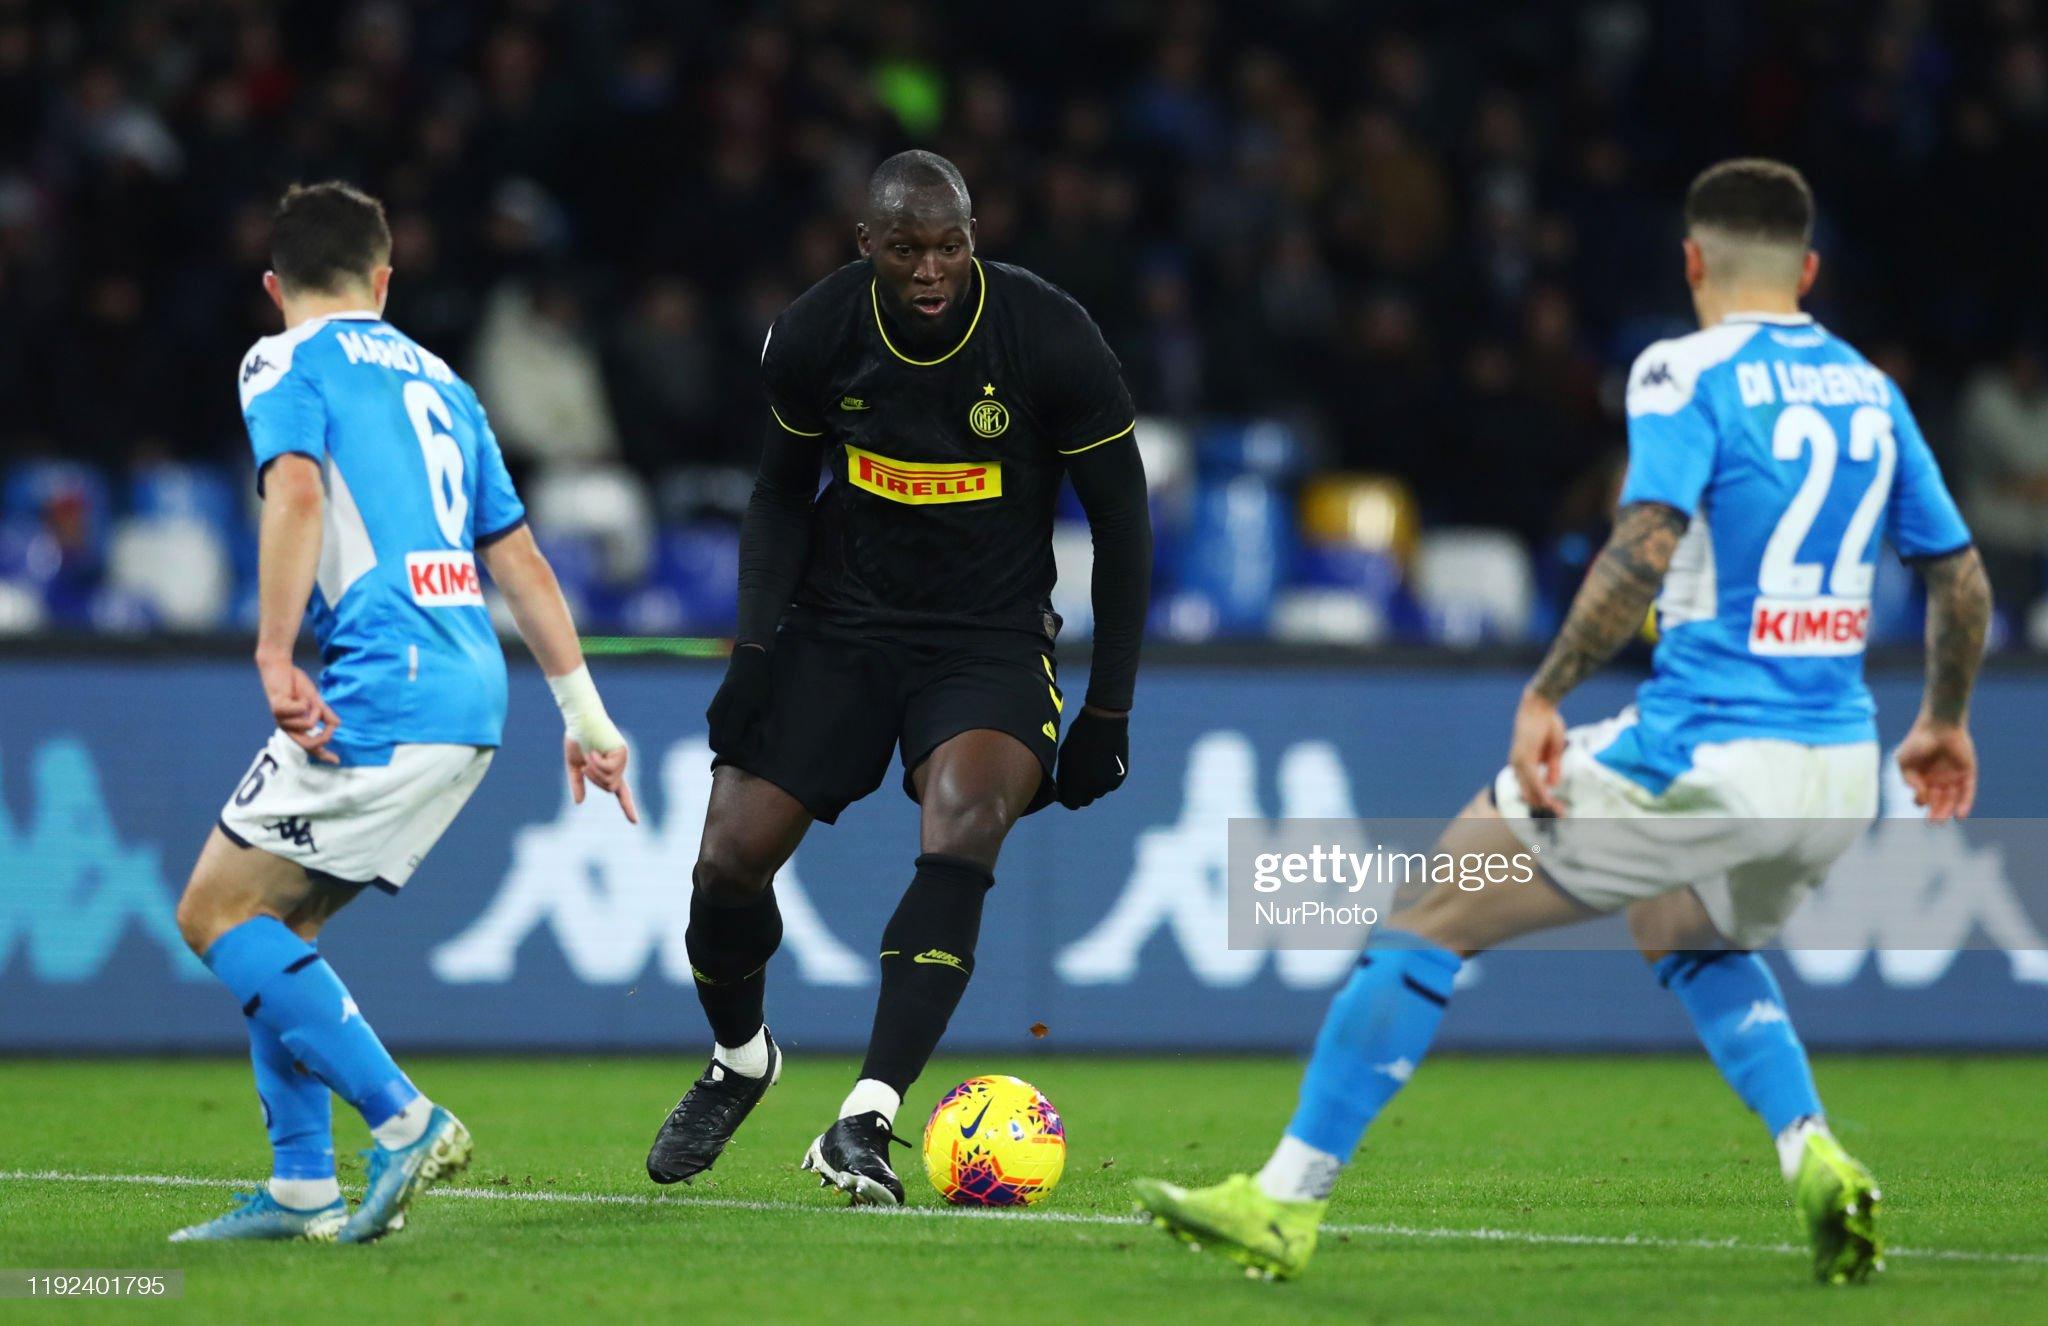 Inter v Napoli preview, prediction and odds